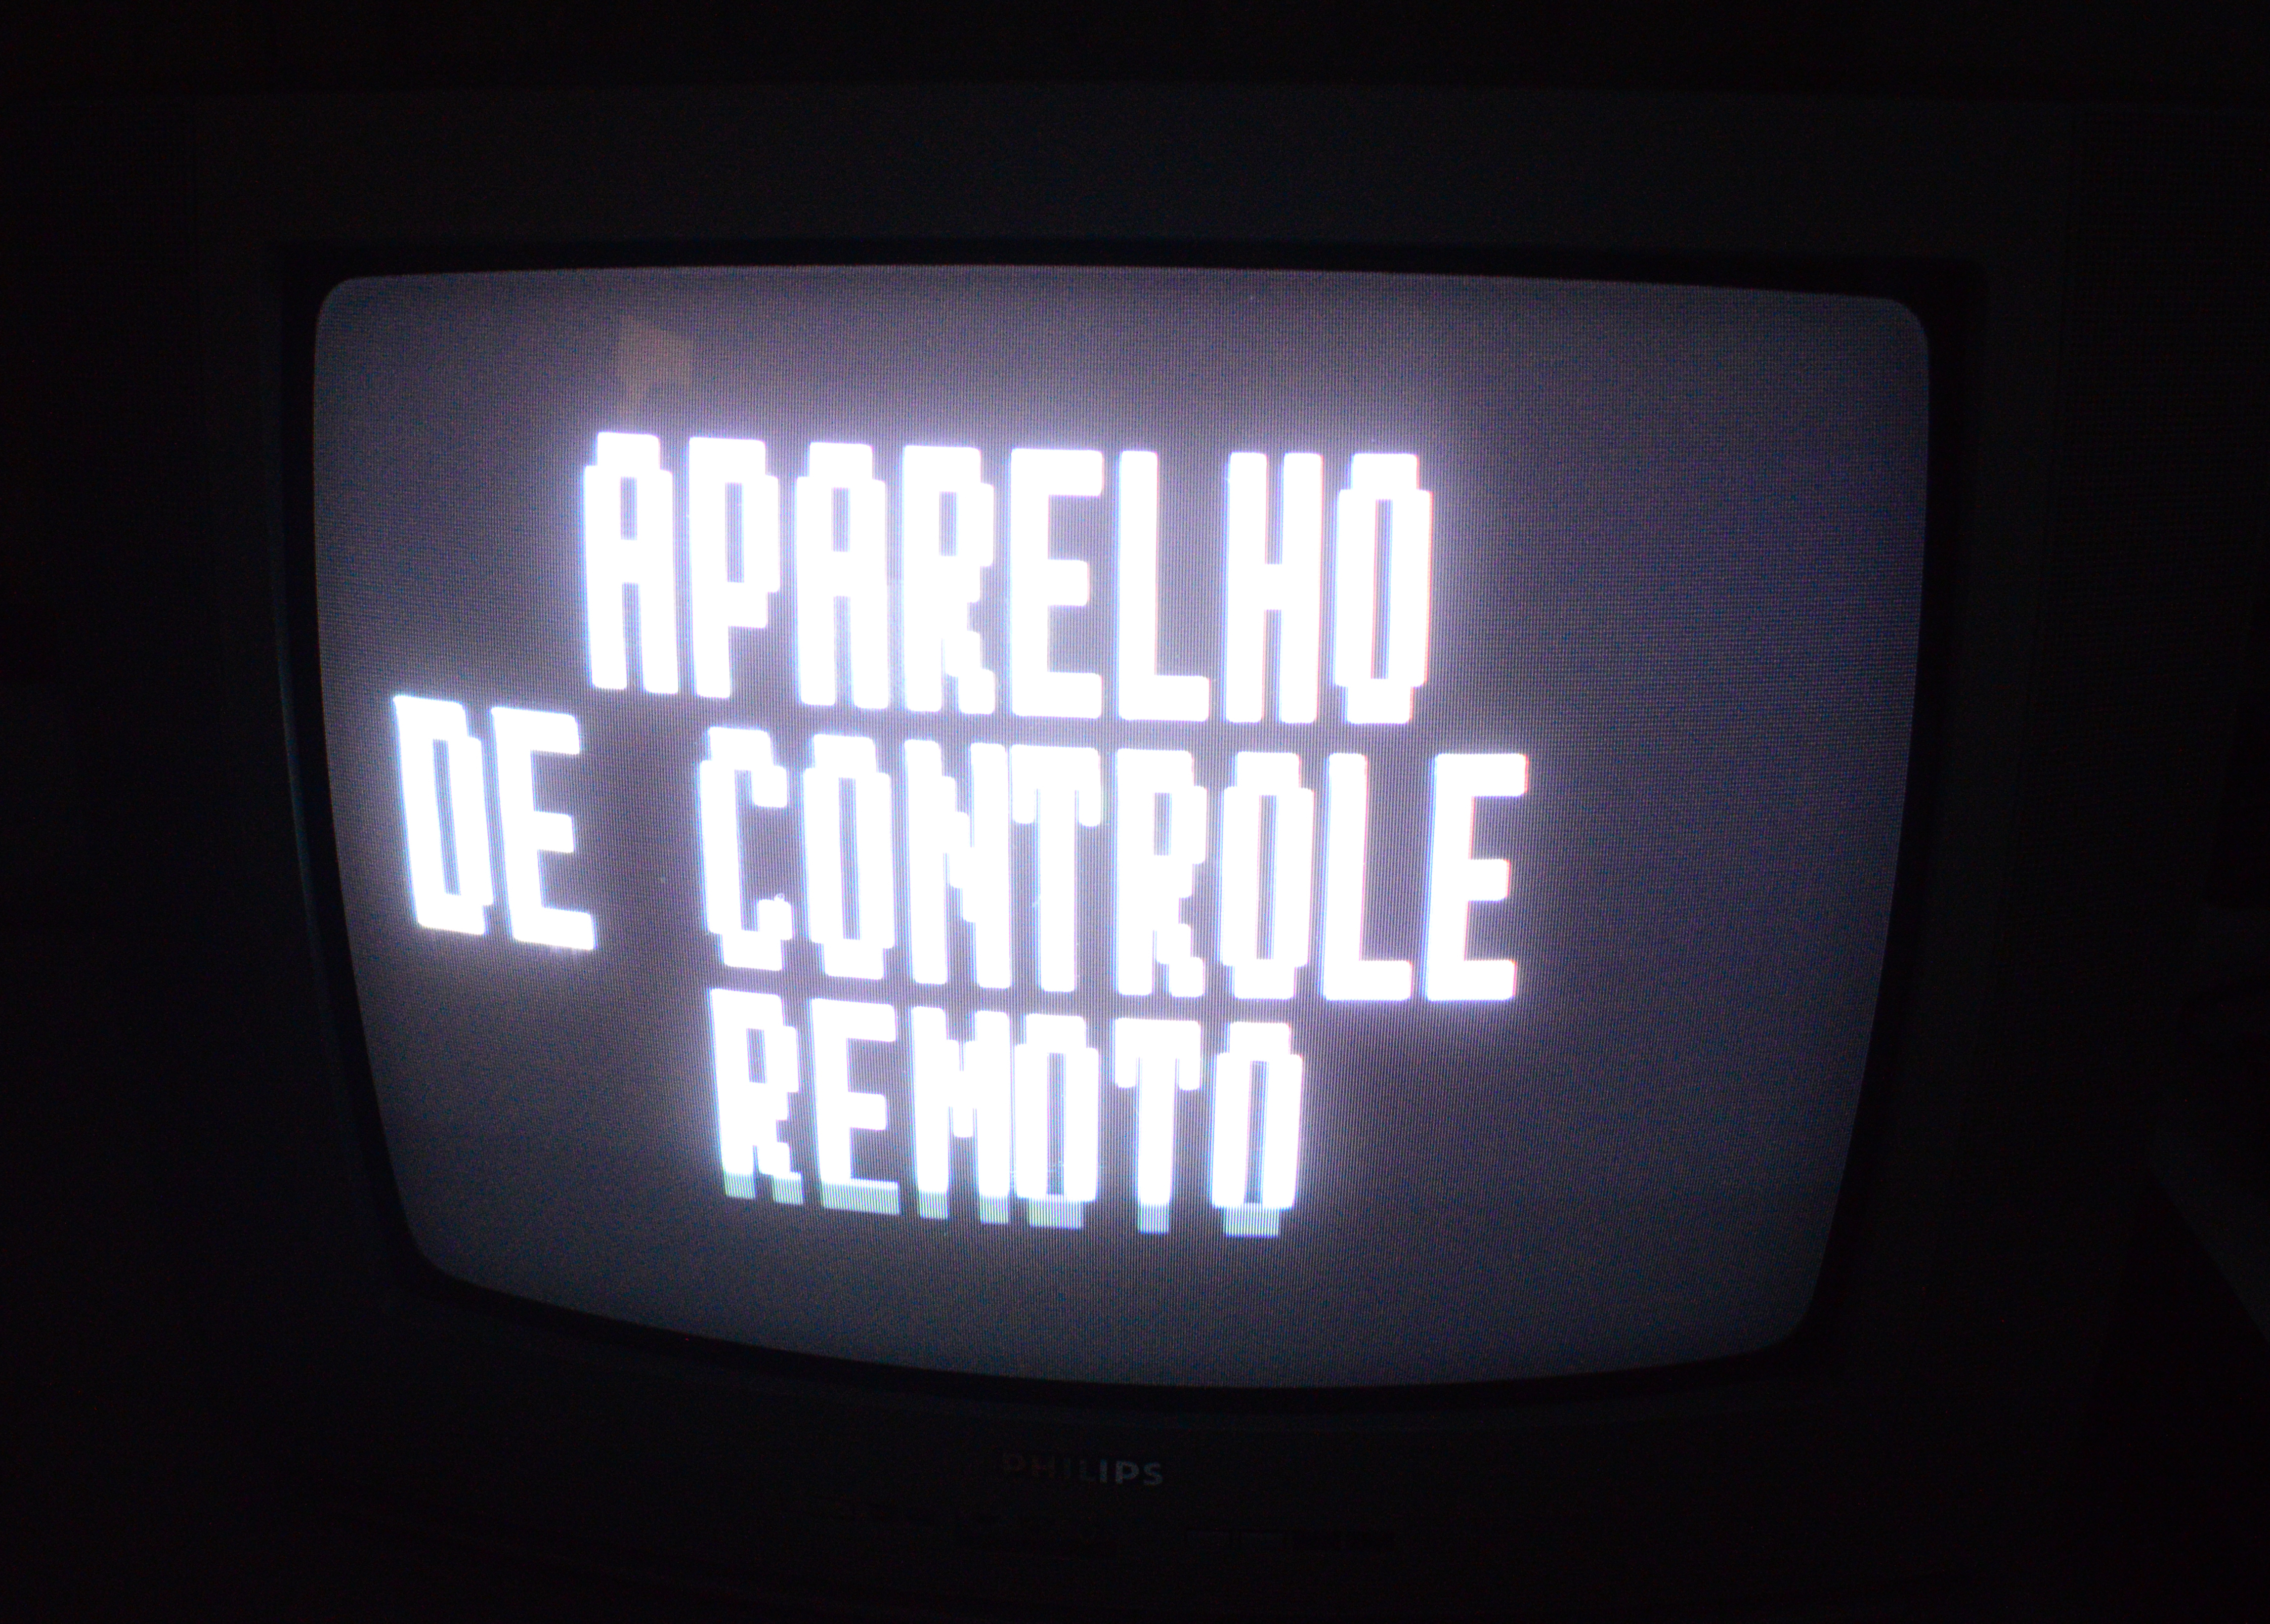 A REVOLUÇÃO SERÁ TELEVISIONADA